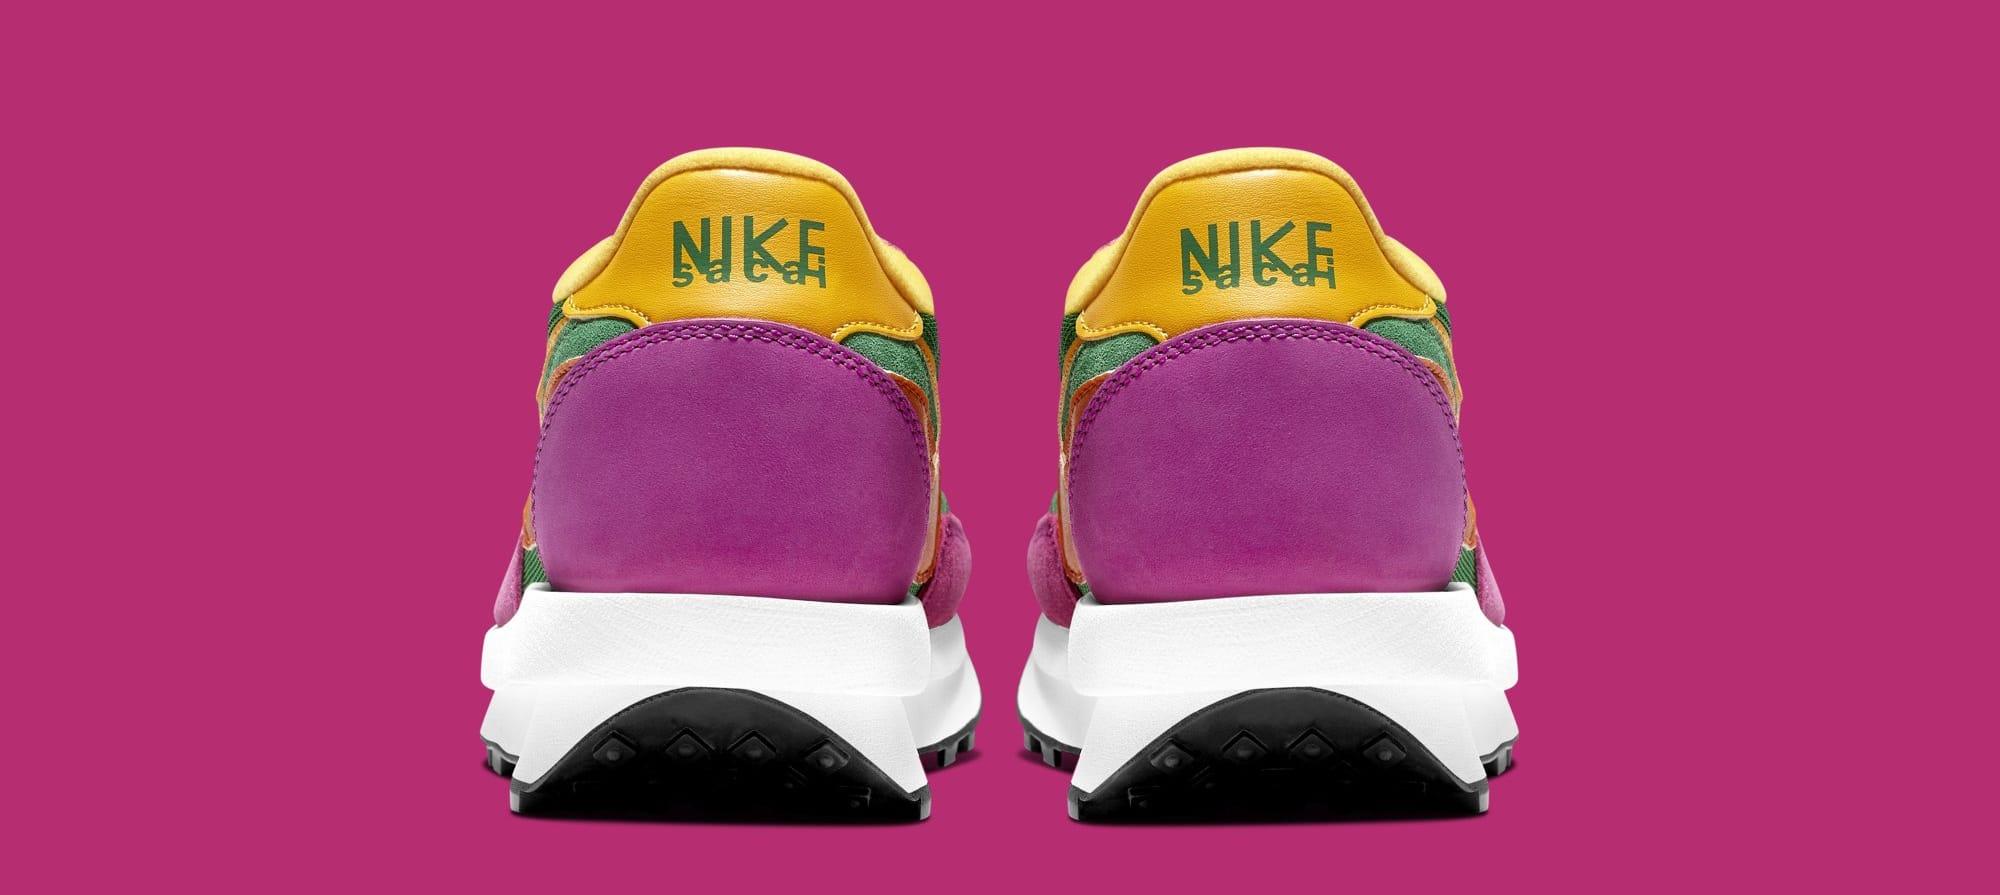 Sacai x Nike LDWaffle BV0073-301 (Heel)